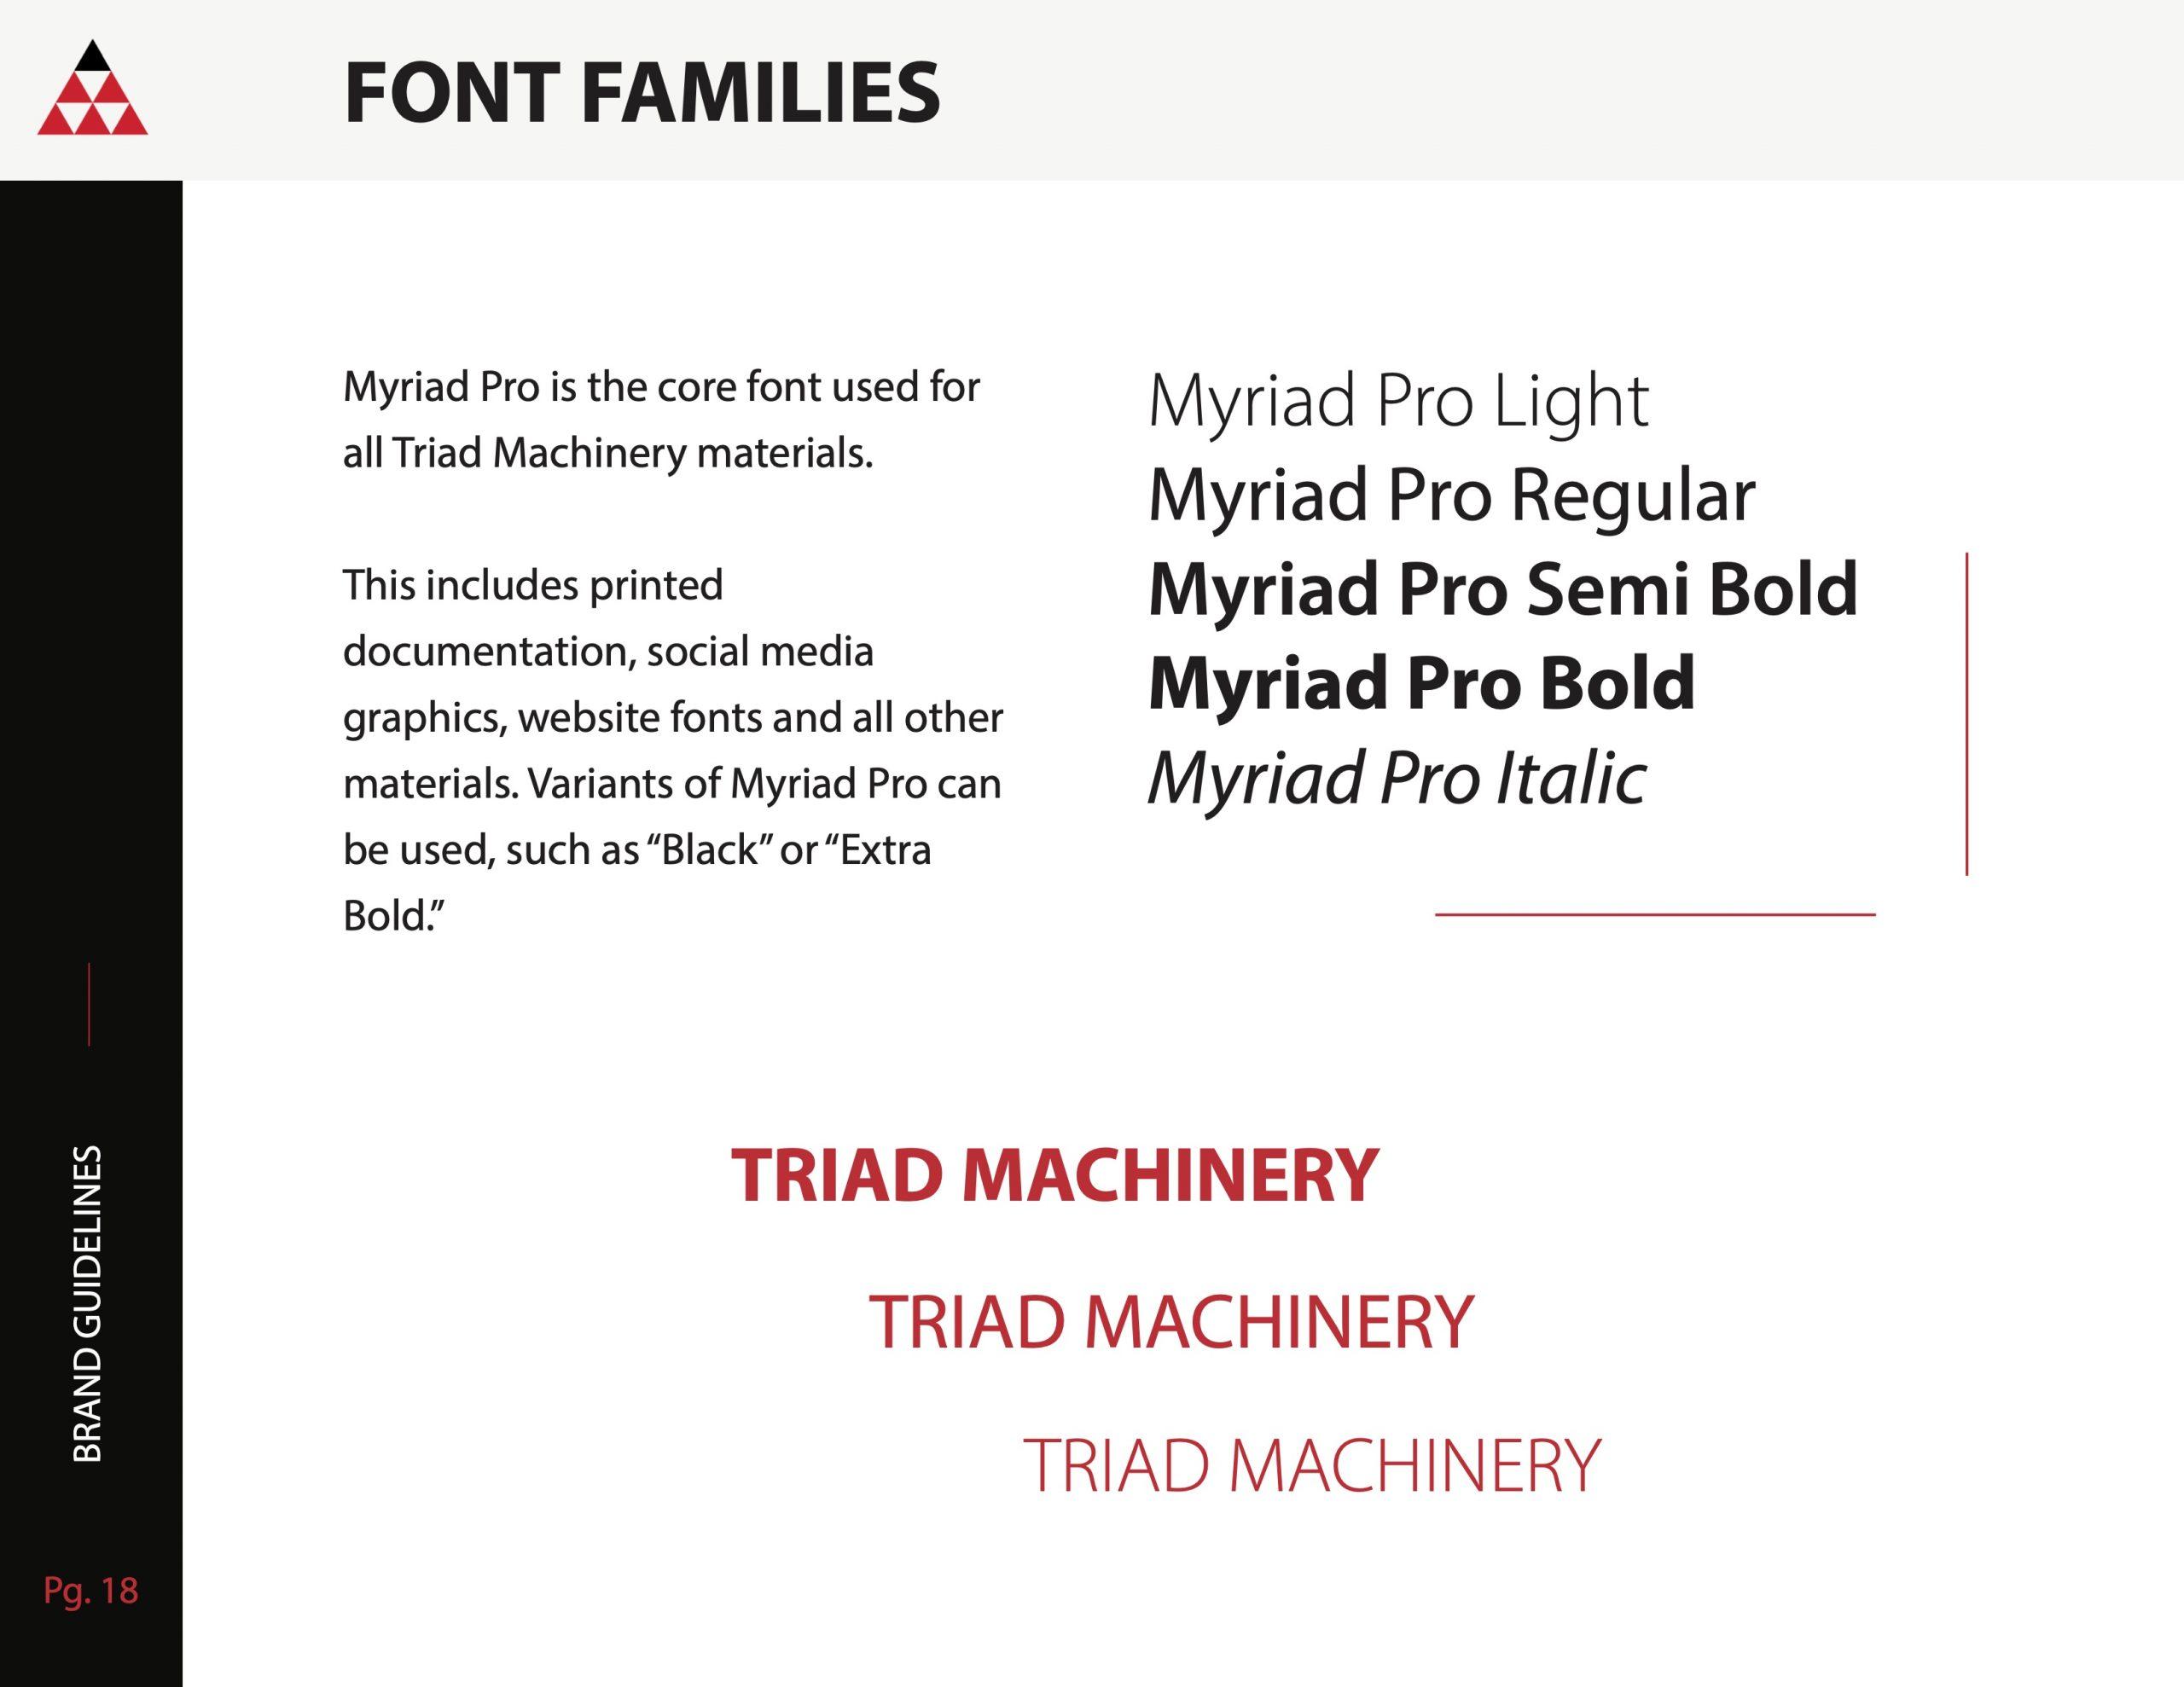 triad-machinery-brand-book-v5-3